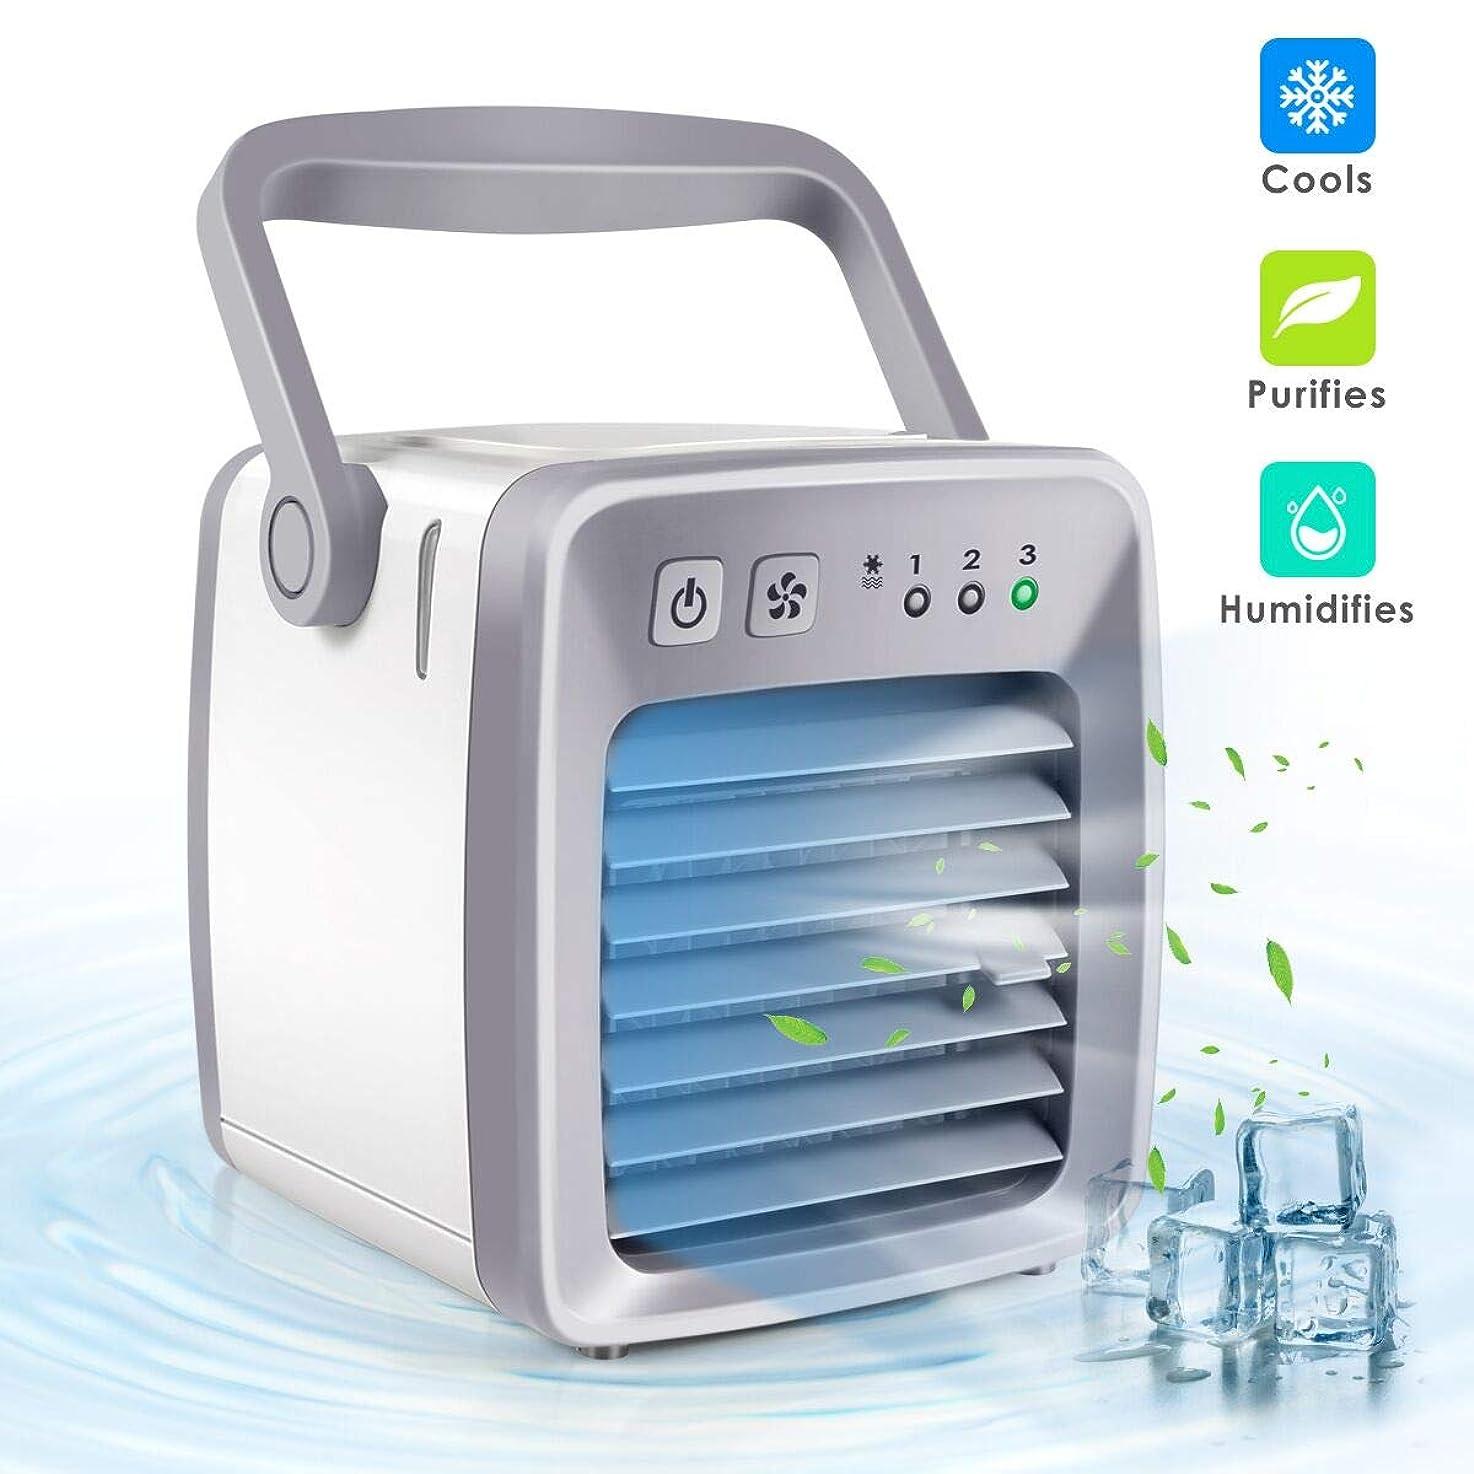 Air Cooler, Mini Portable Air Conditioner Fan Noiseless Evaporative Air Humidifier, Personal Space Air Conditioner, Mini Cooler,3 Gear Speed, Office Cooler Humidifier & Purifier uxgheqmgsdkxb9